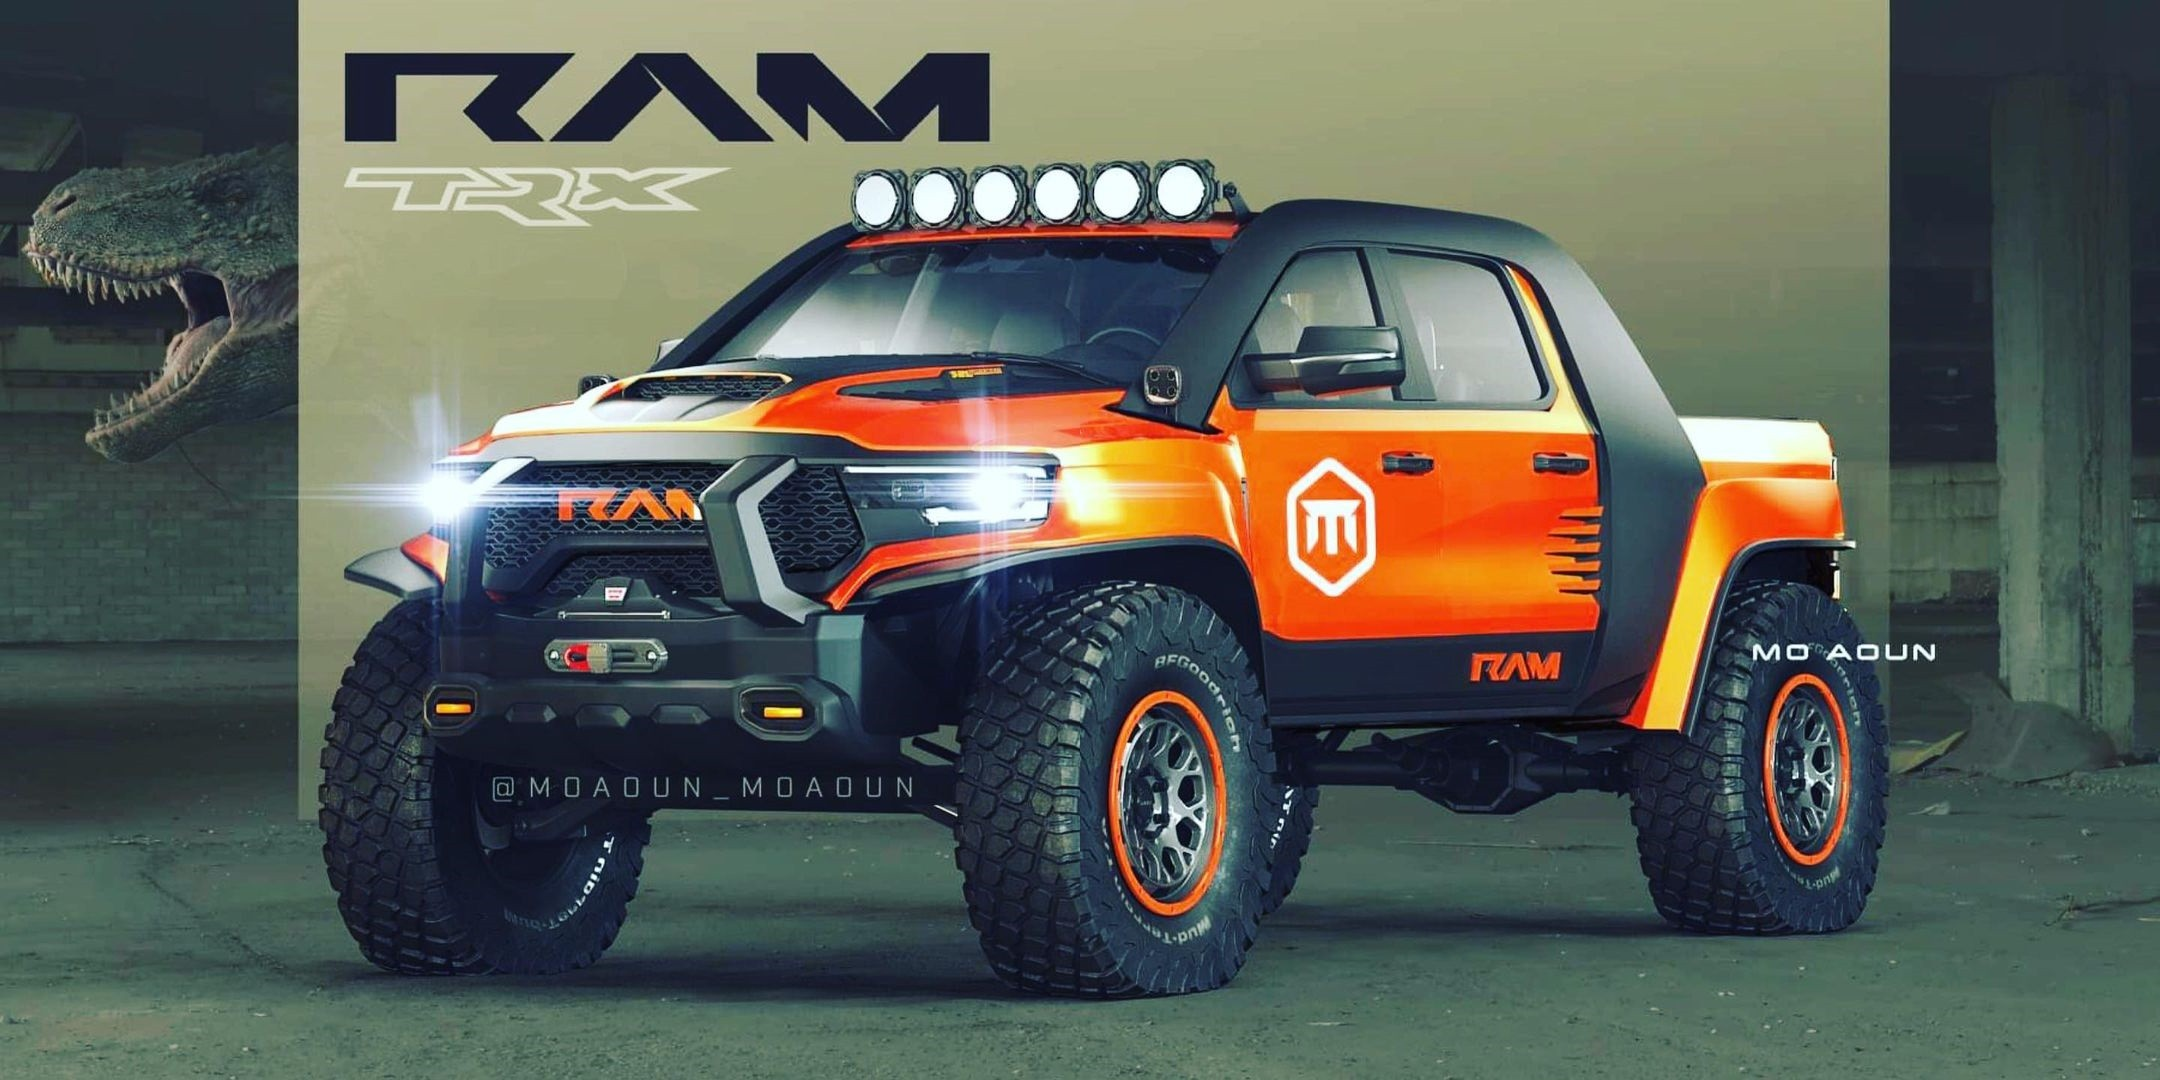 2021-ram-1500-trx-strong-survivor-redesi